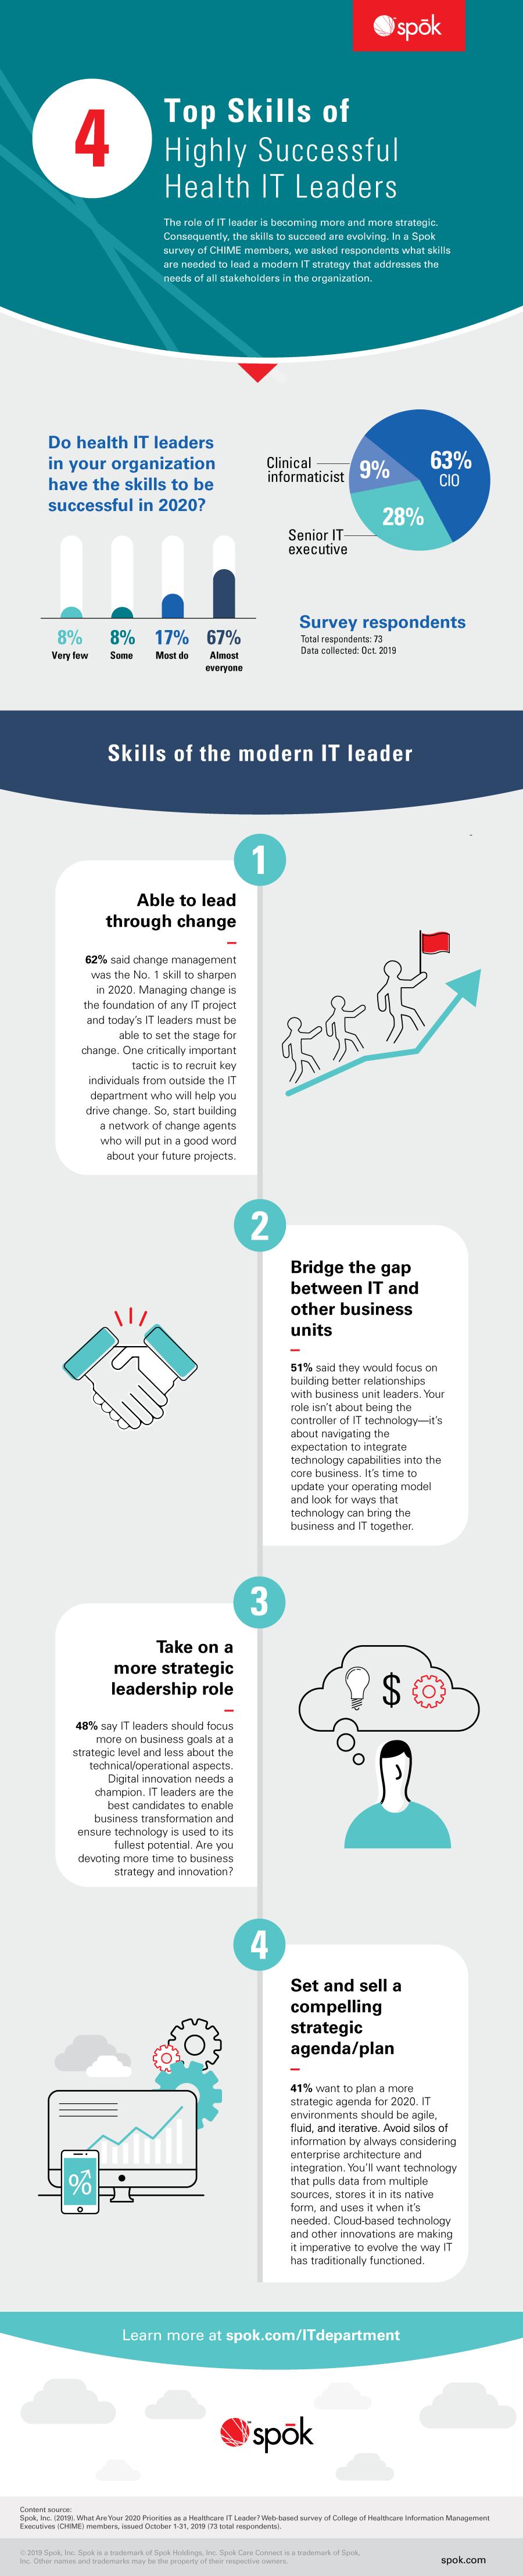 IG-Top-4-Skills-Health-IT-Leaders-Need-to-Improve-in-2020